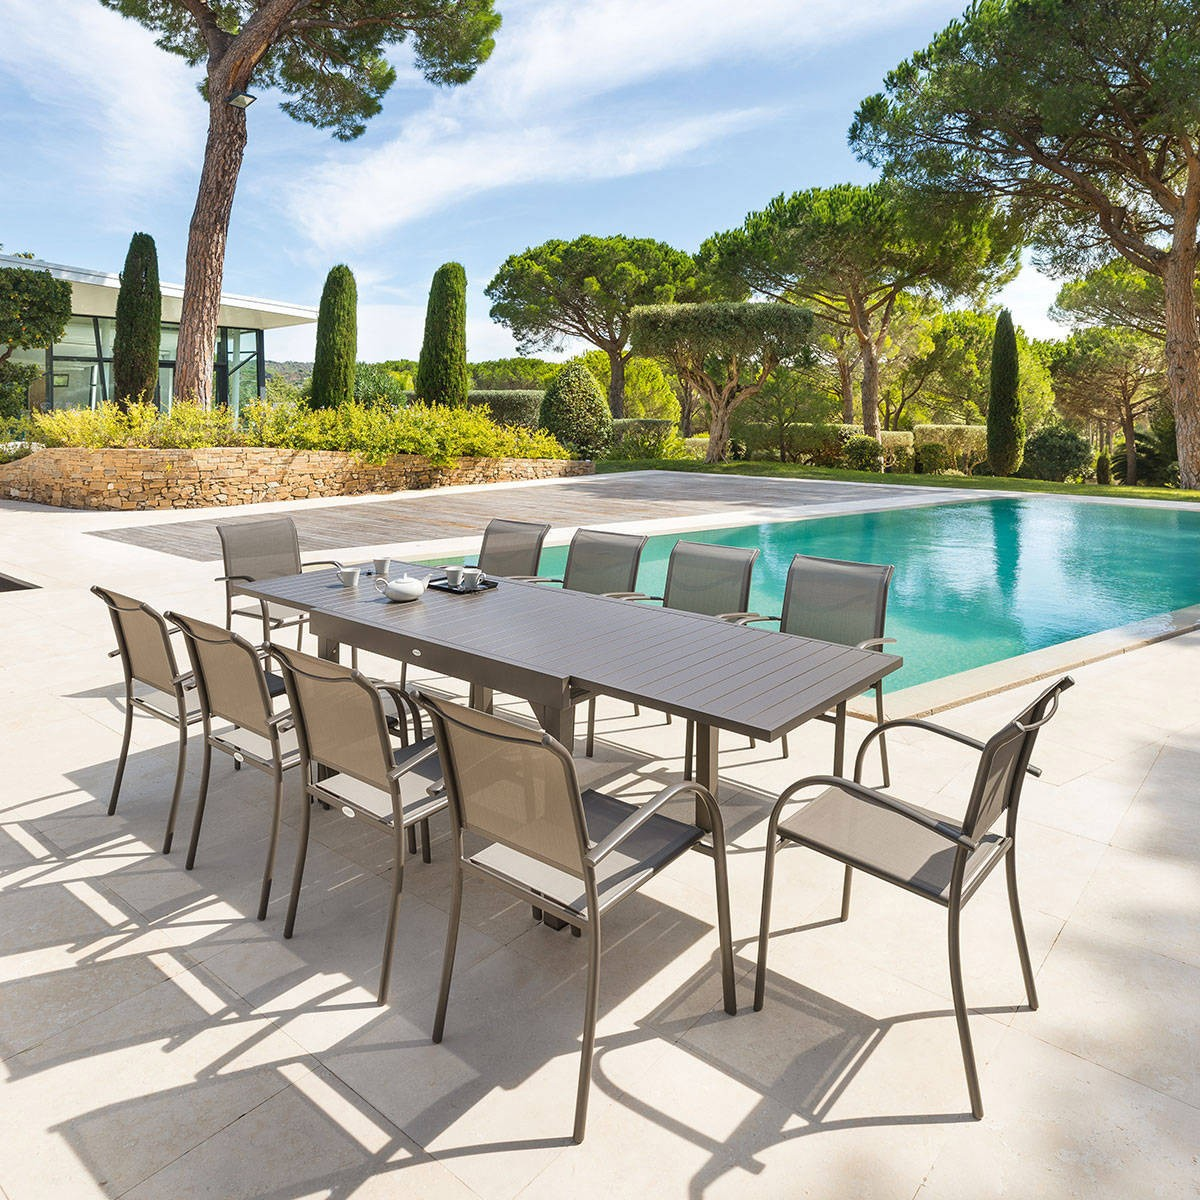 Table de jardin extensible PIAZZA - Hespéride - 10 Personnes - Aluminium